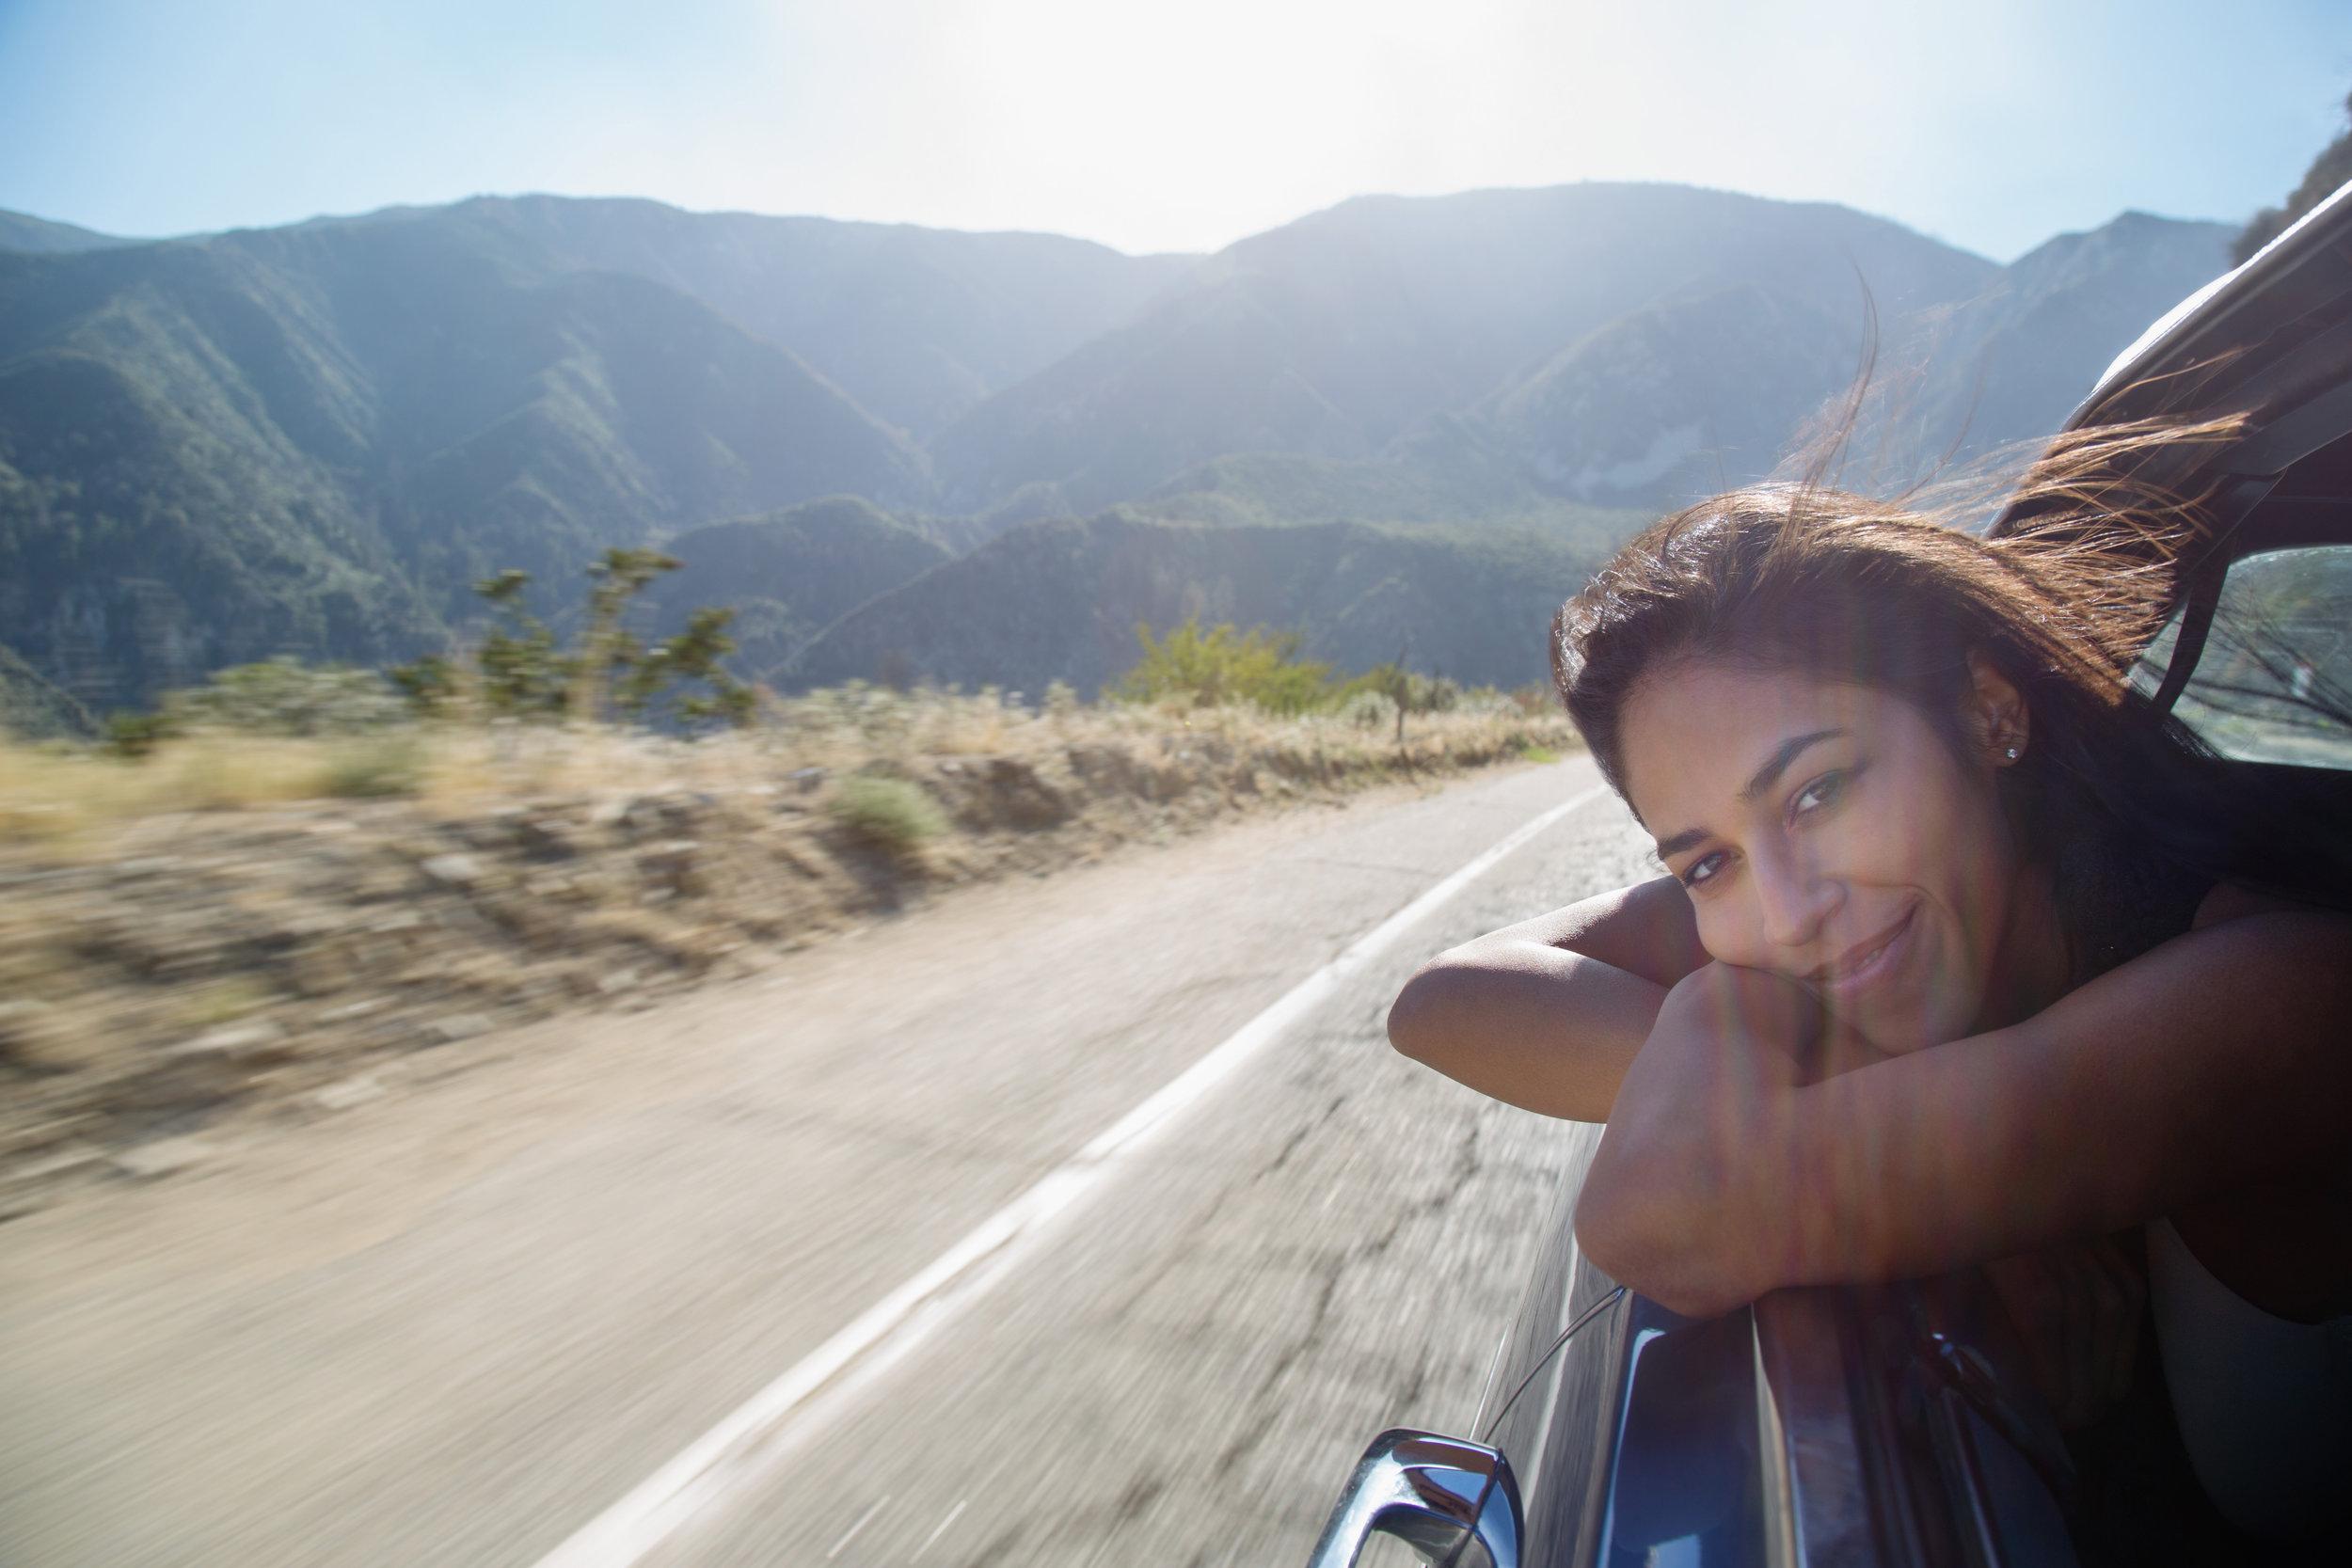 2015.10.22_Trip_woman_car_9668.jpg